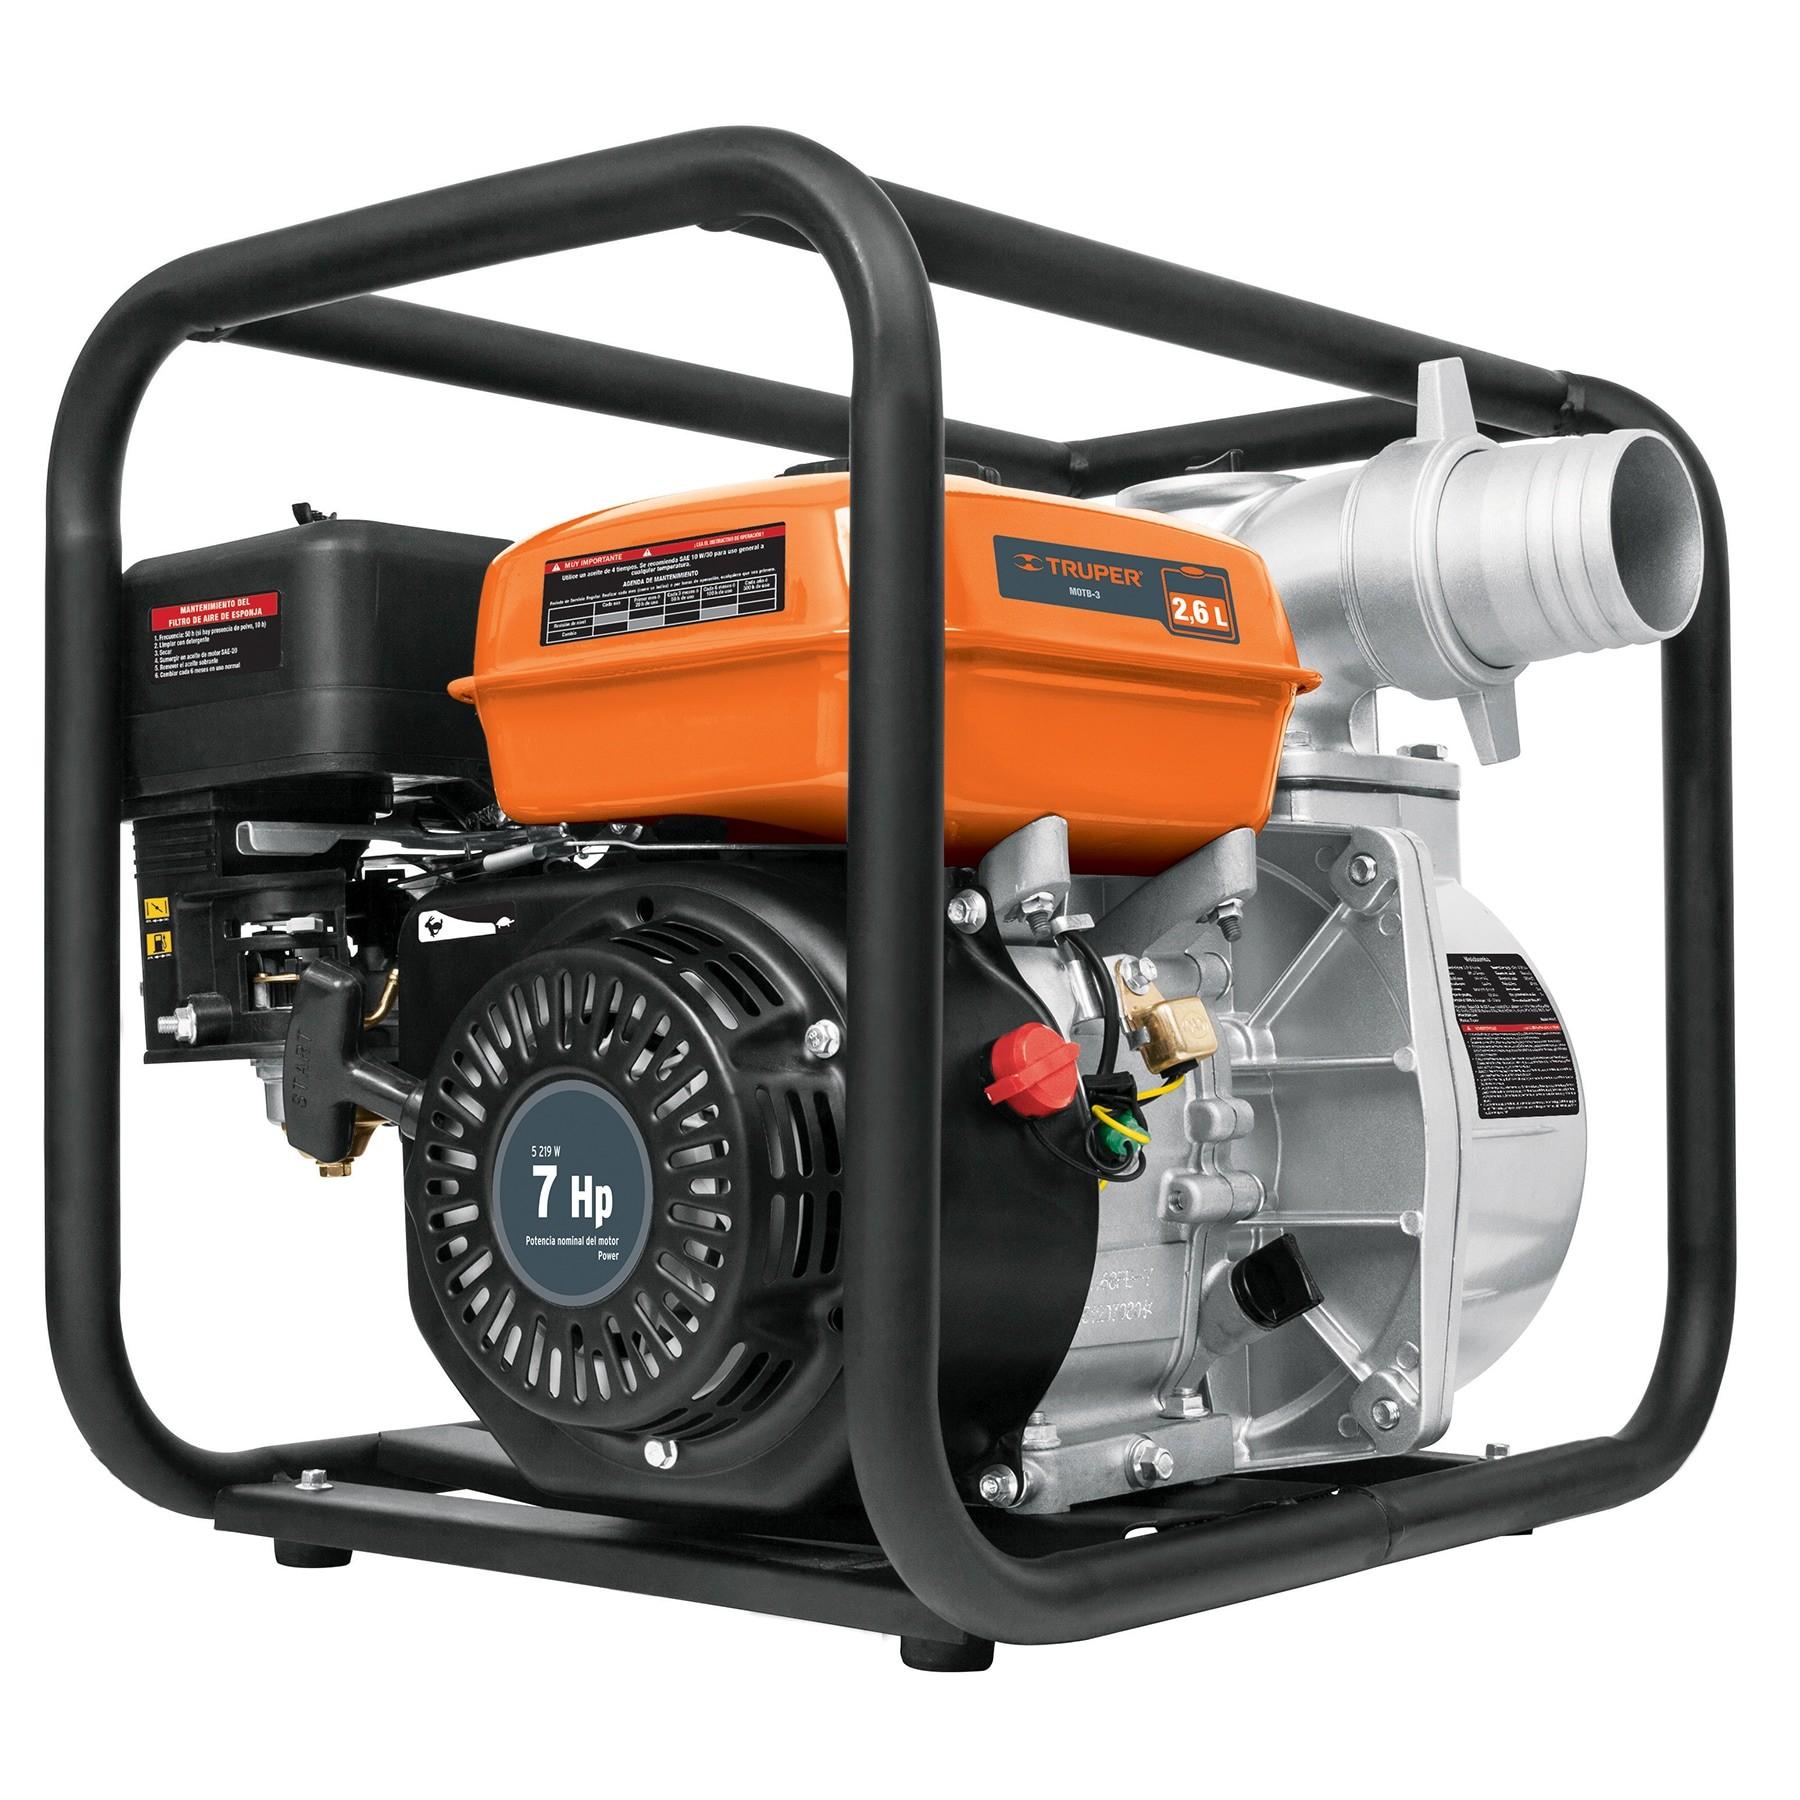 "Motobomba autocebante 3x3"", 7 HP, a gasolina"